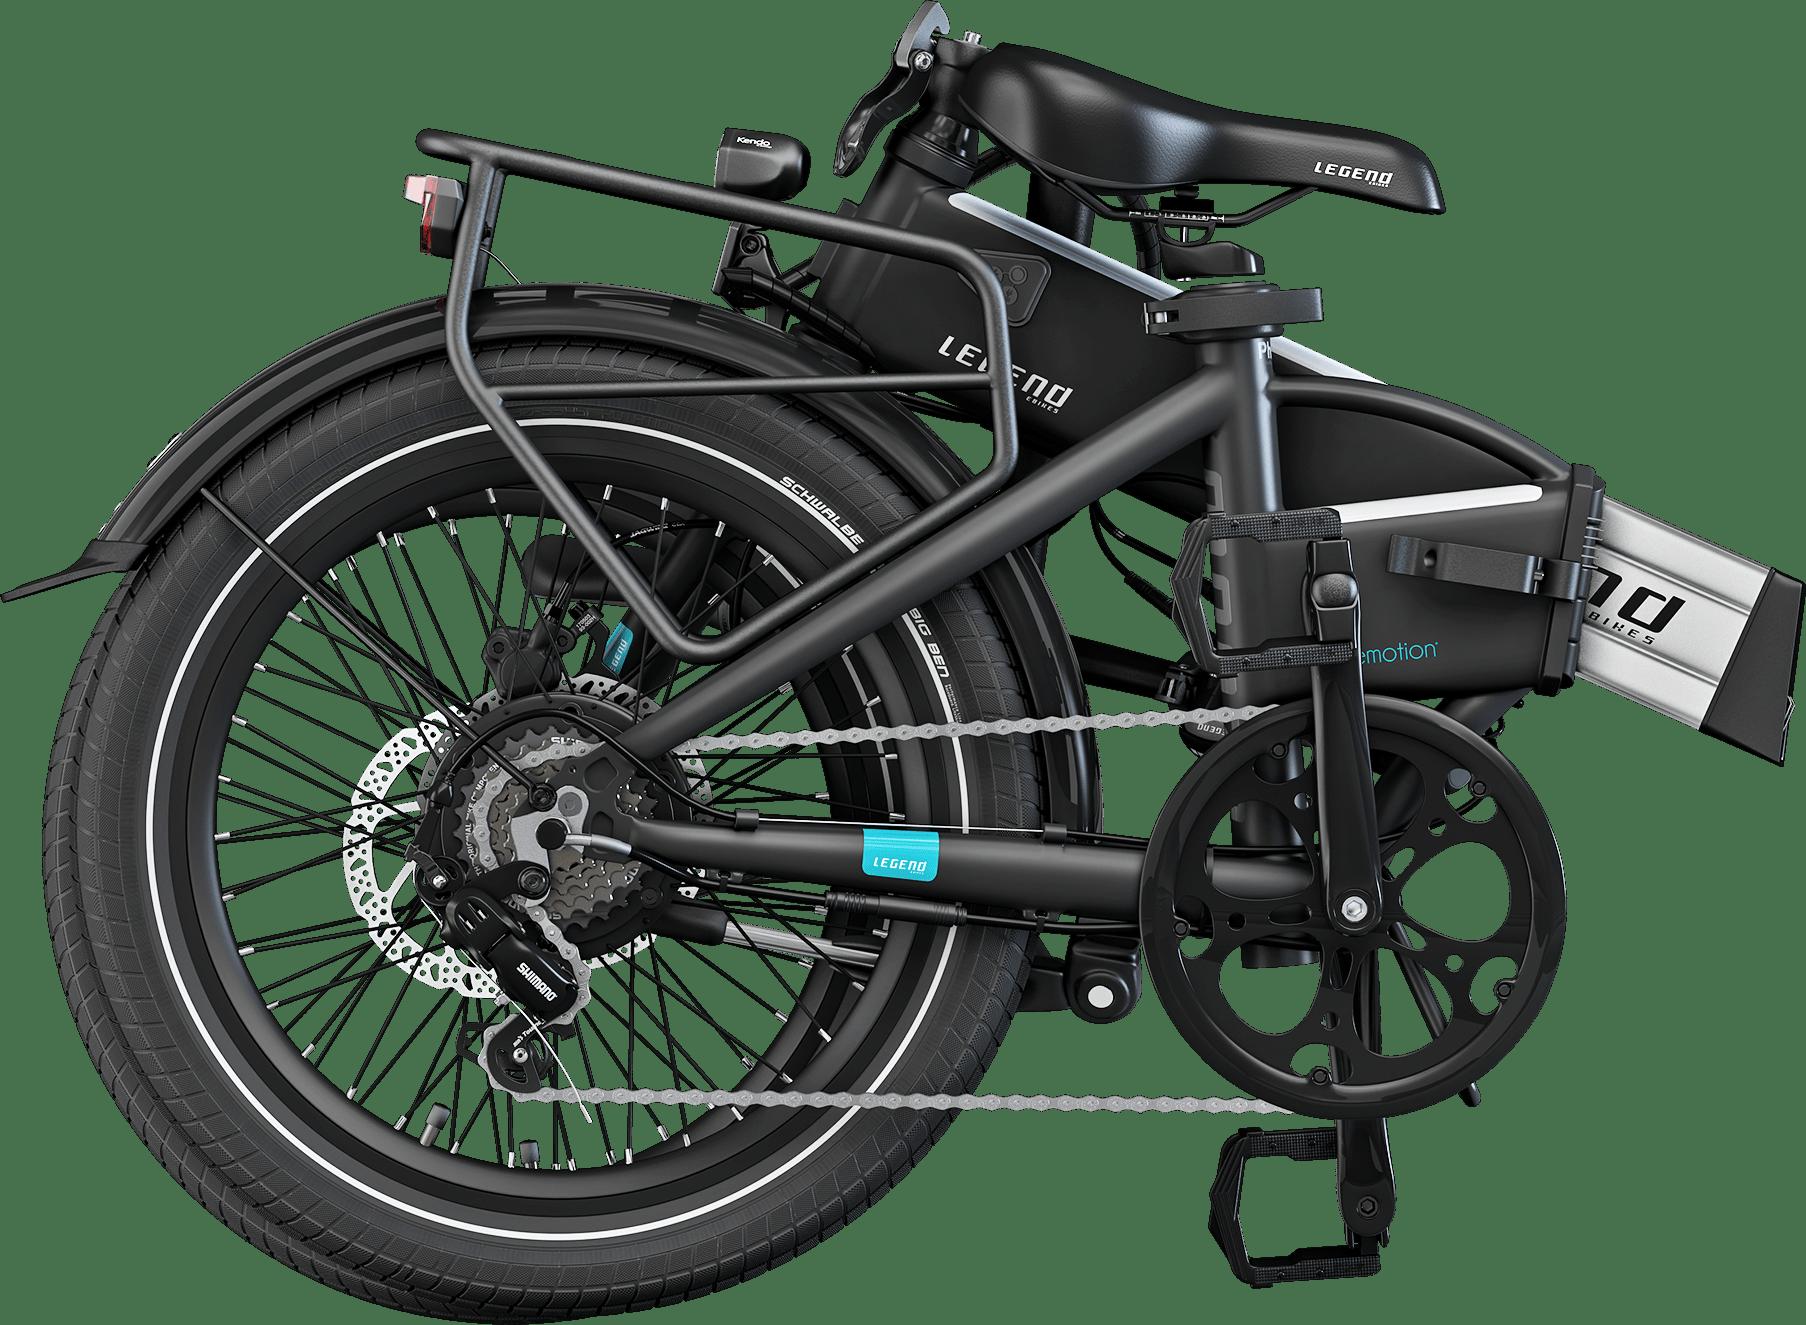 Smart Klapp E Bike Legend Monza 14ah Batterie Grau